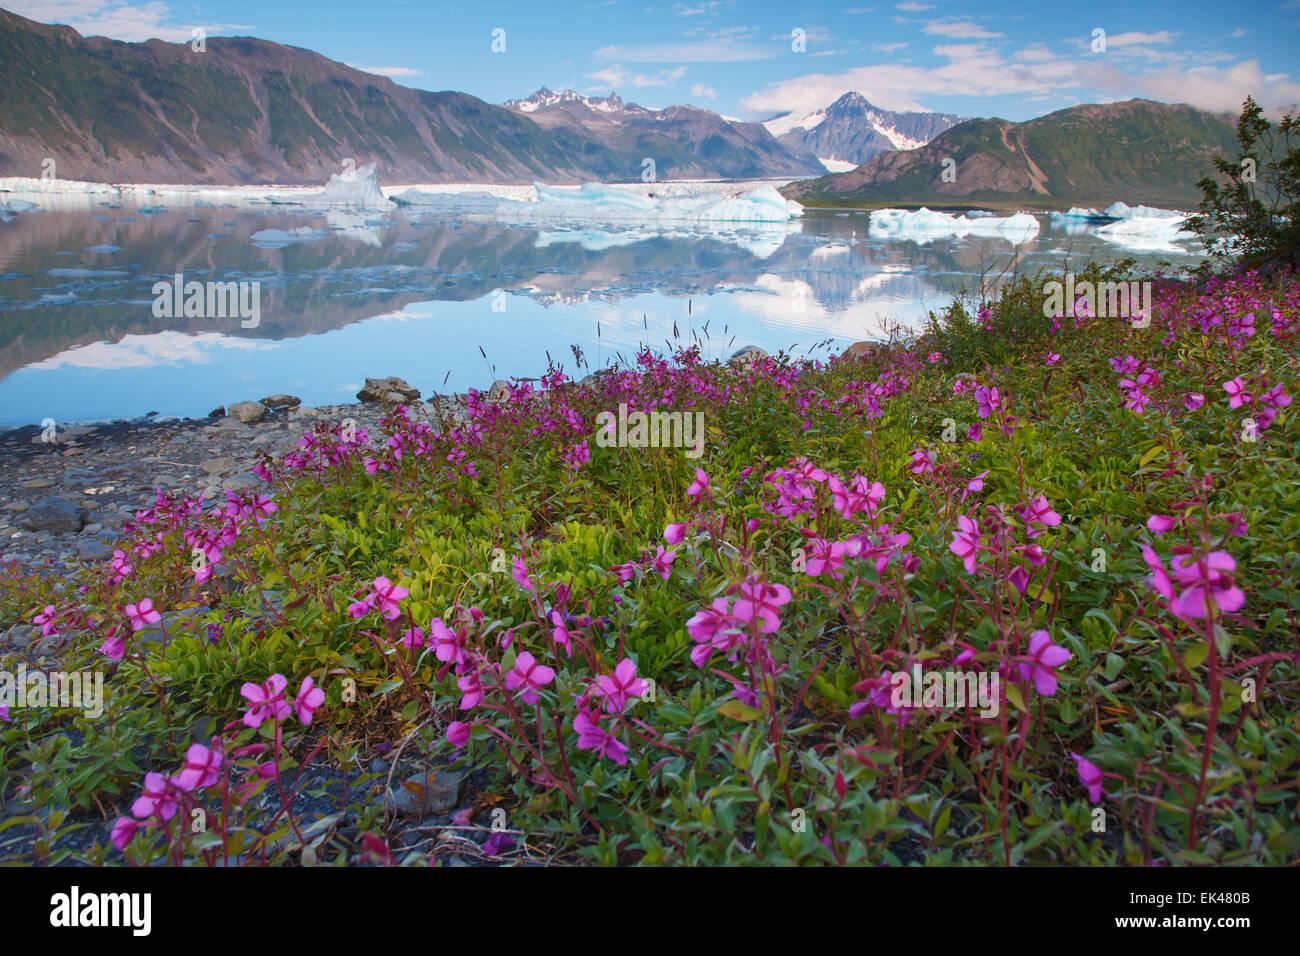 Lagon Bear Glacier, Kenai Fjords National Park, près de Seward, en Alaska. Photo Stock